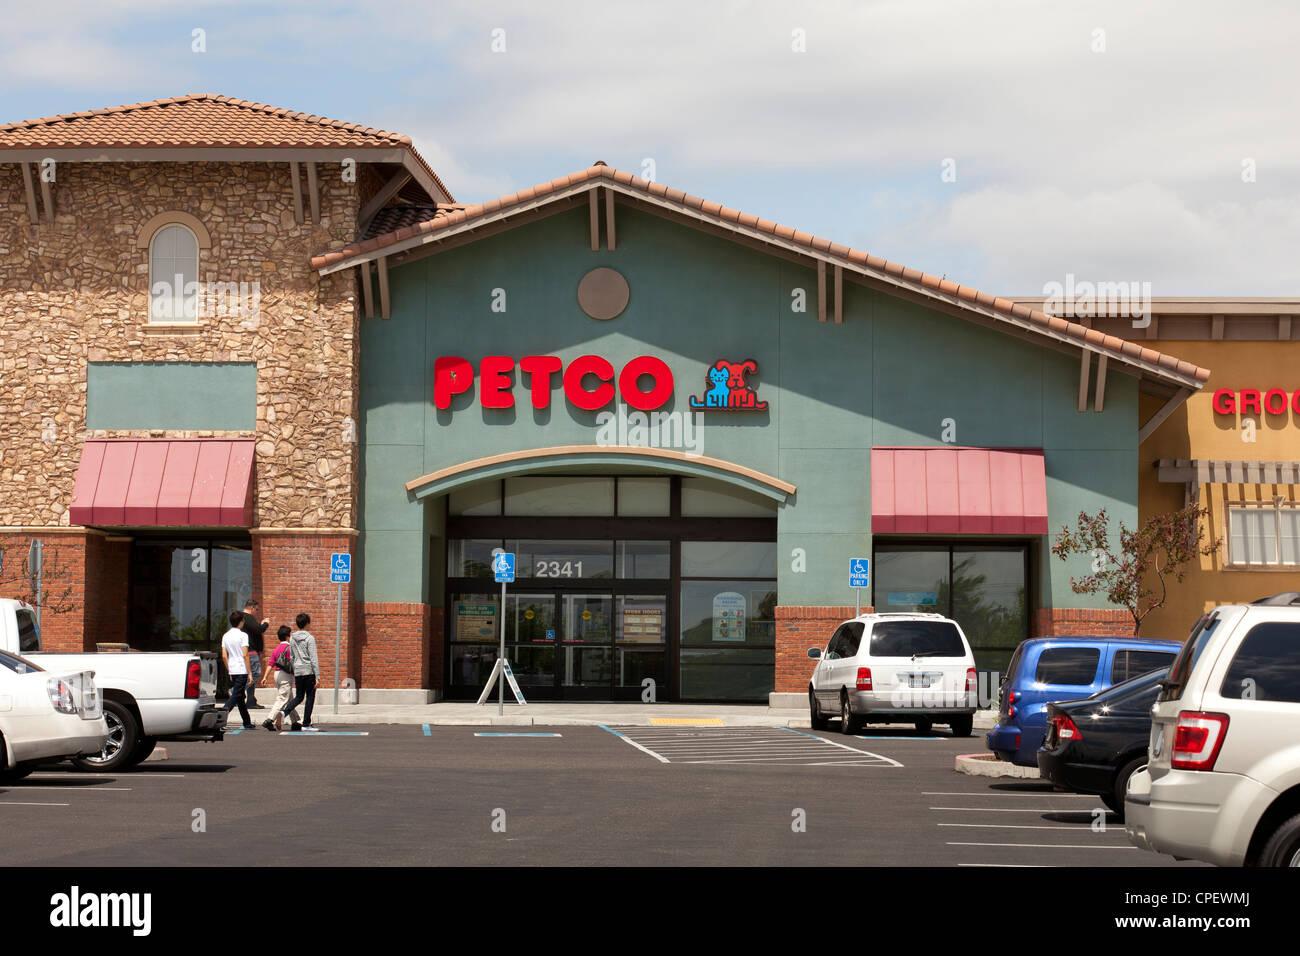 Petco - Petco Storefront